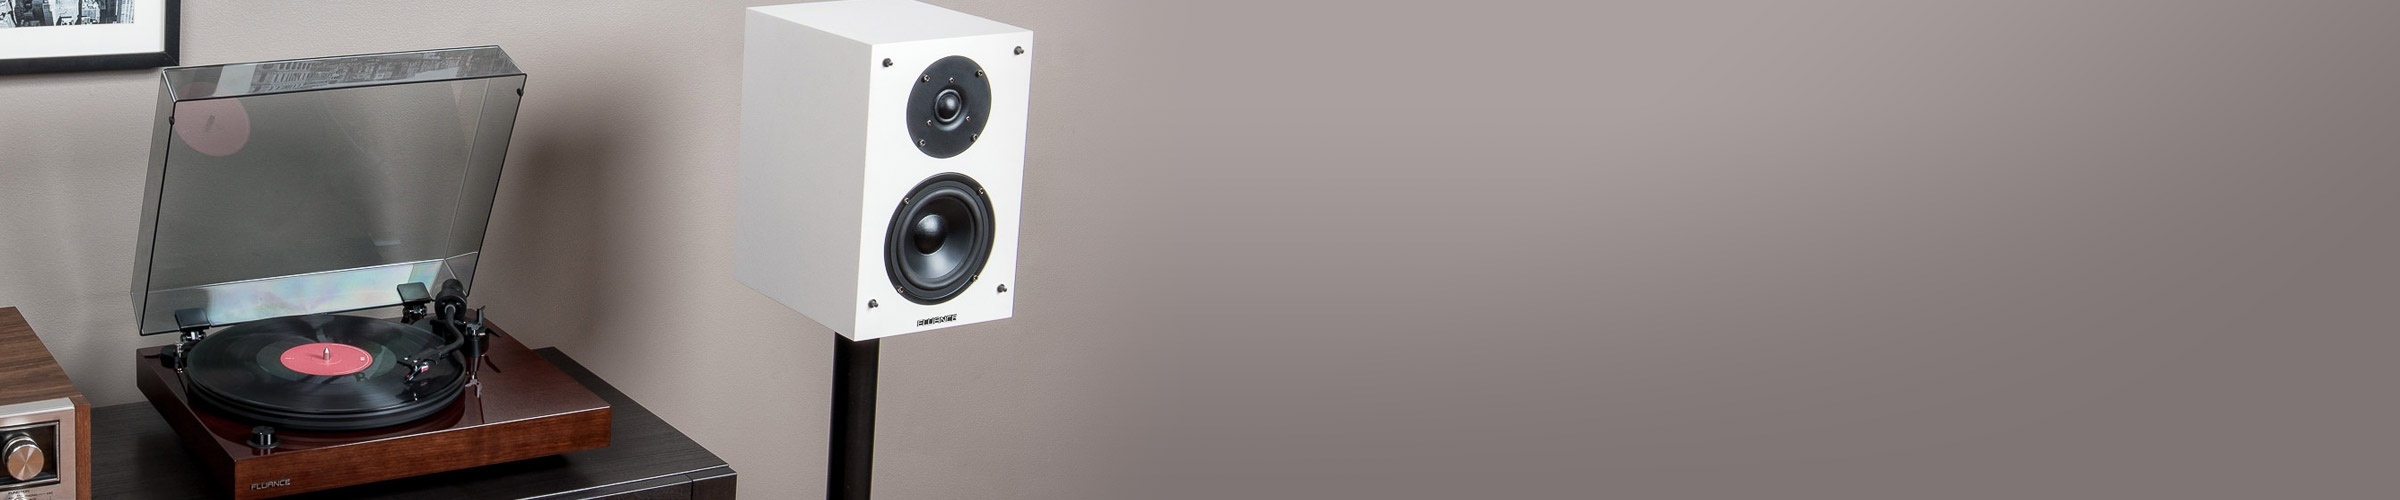 SX Series Floorstanding Speaker Matched Set